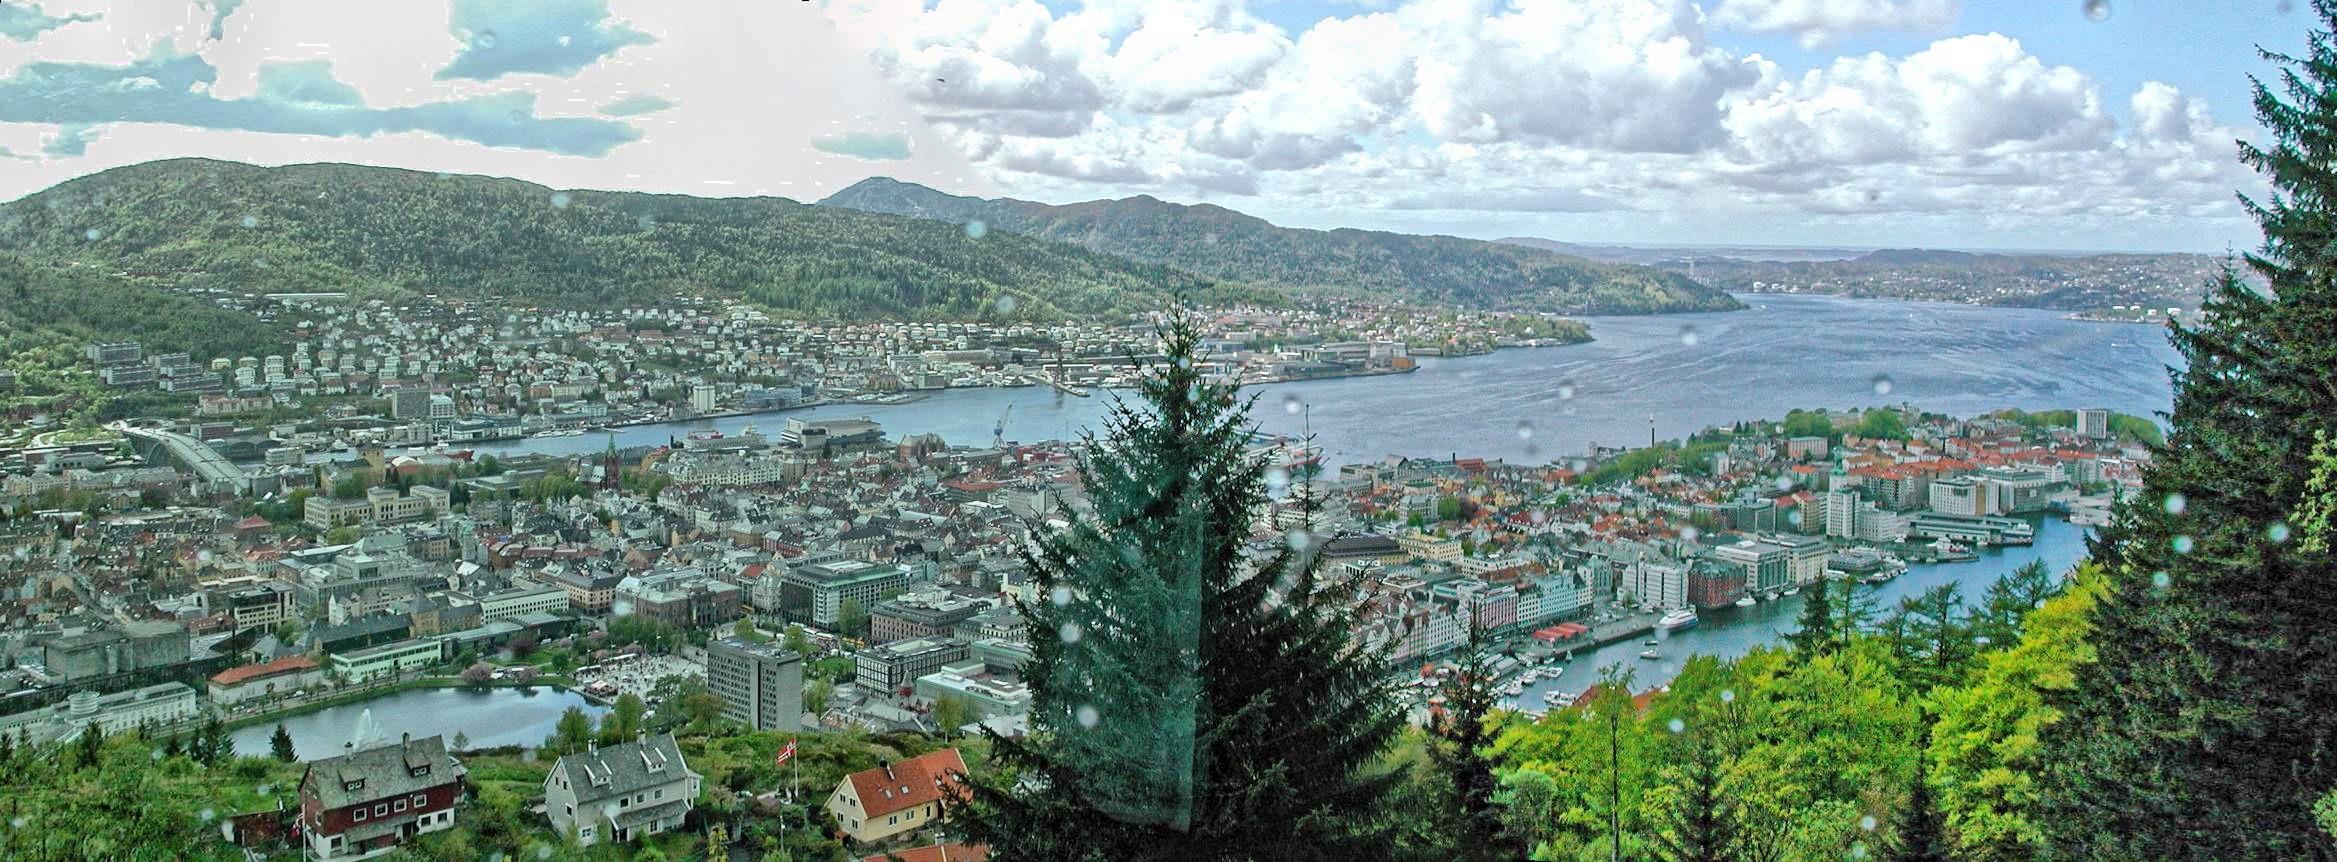 Bergen-panorama-2.jpeg